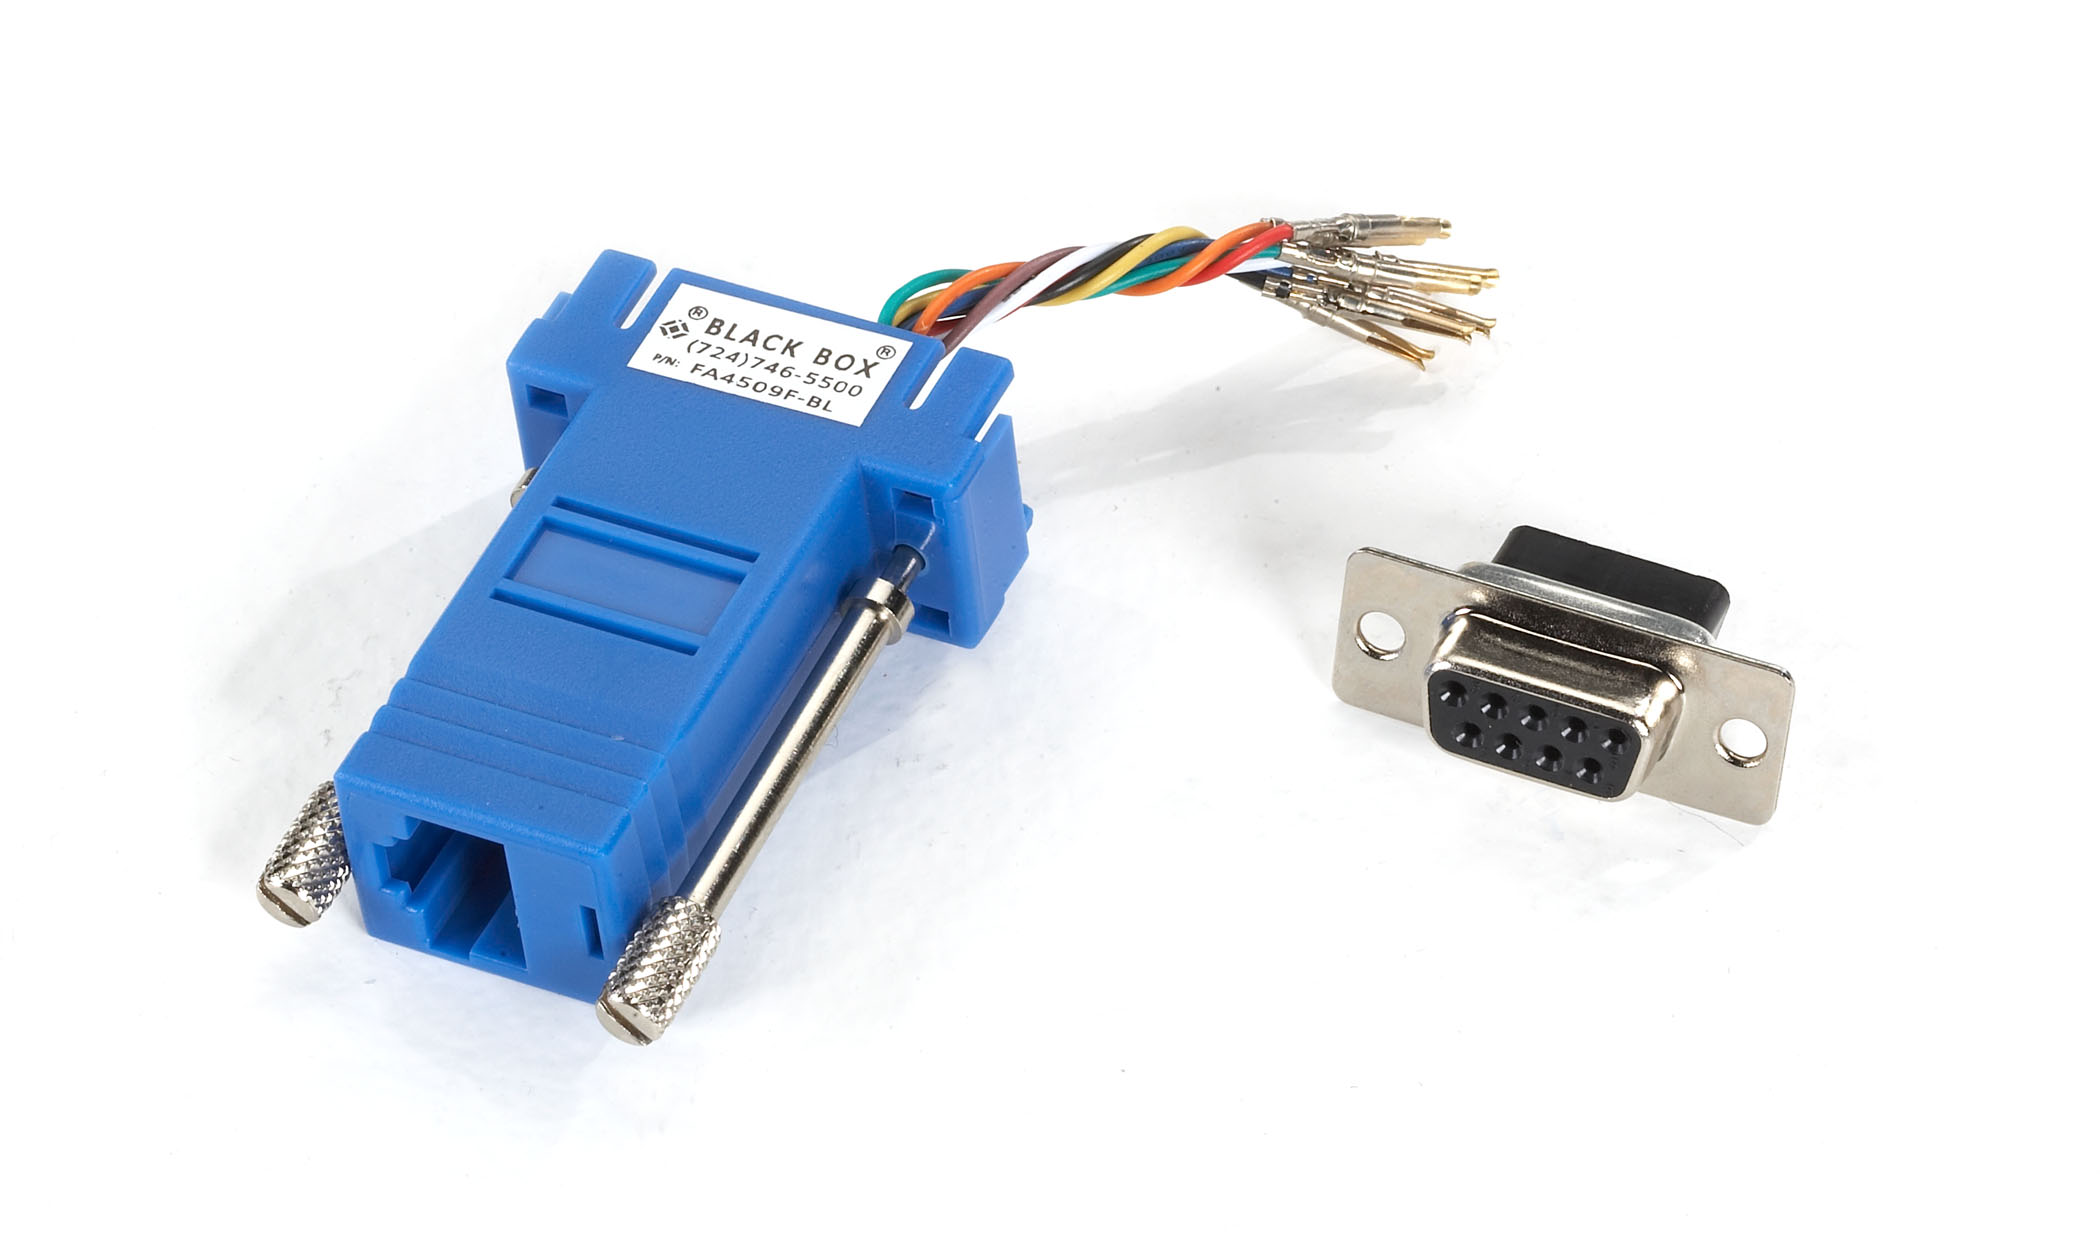 Modular Adapter Kit DB9 Female RJ45 Female Blue | Black Box